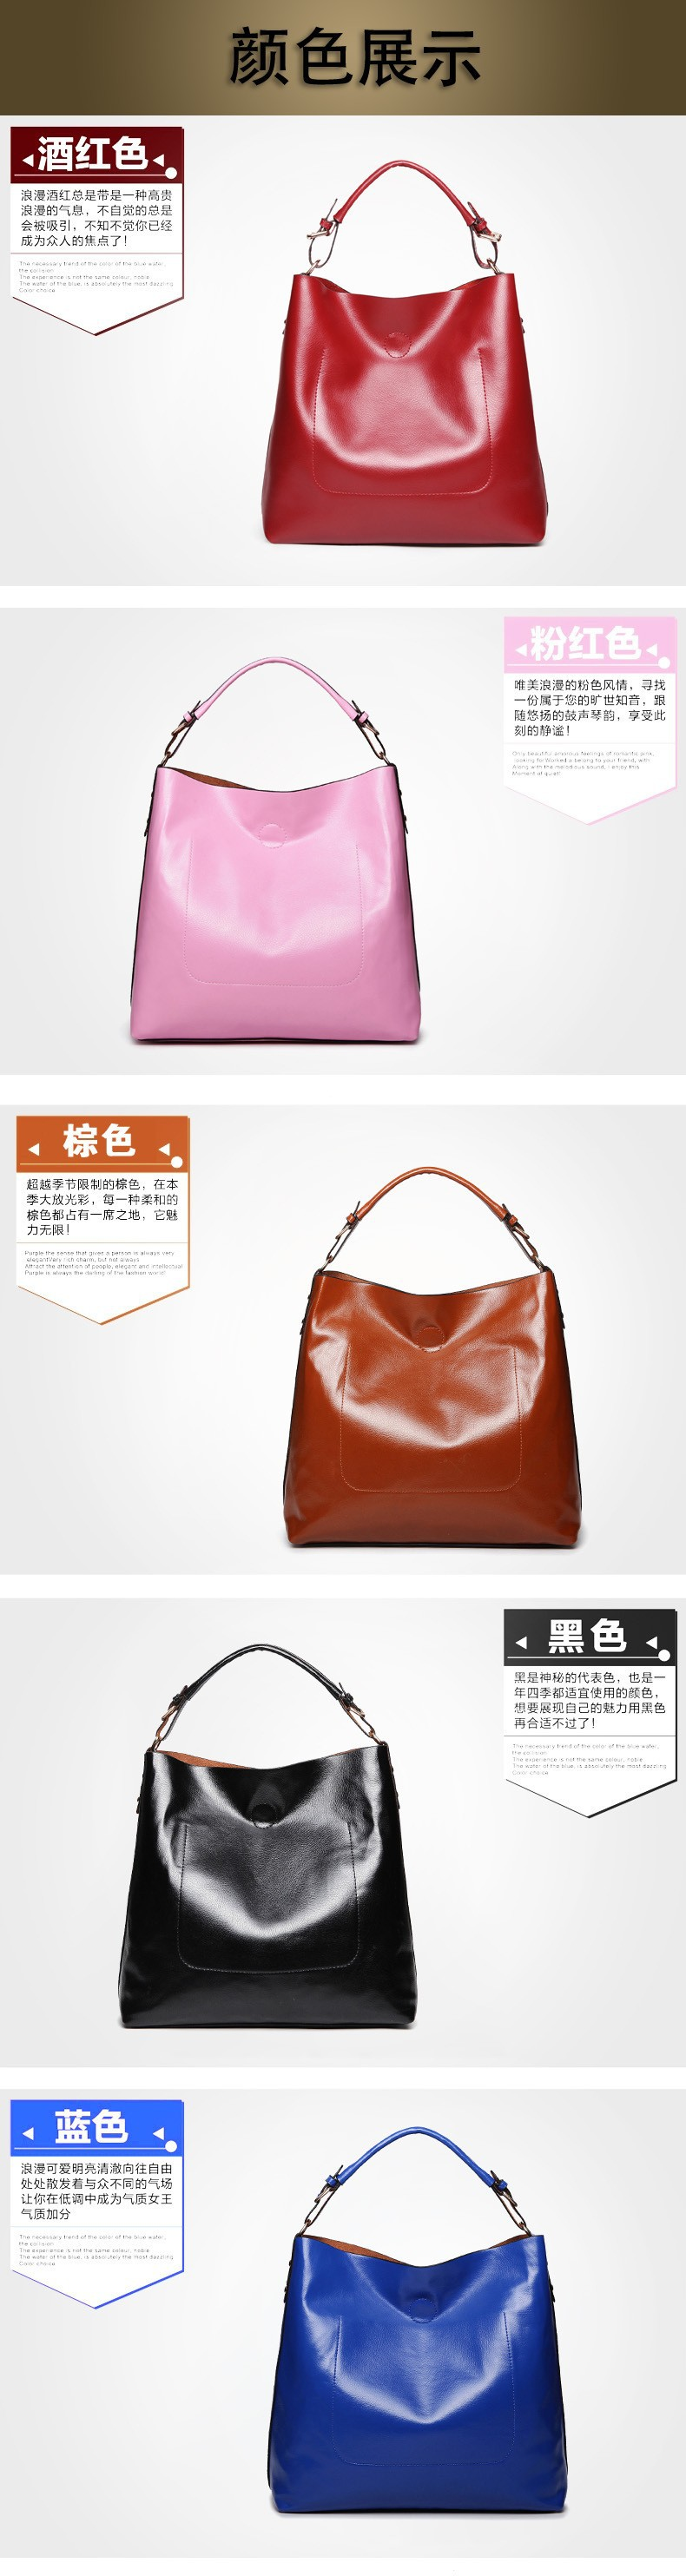 Ladies Composite Handbags Woman Fashion Pu Leather Bags Crossbody Bag For Women Fashion 2015 Designer High Quality Bags BH270 (17)